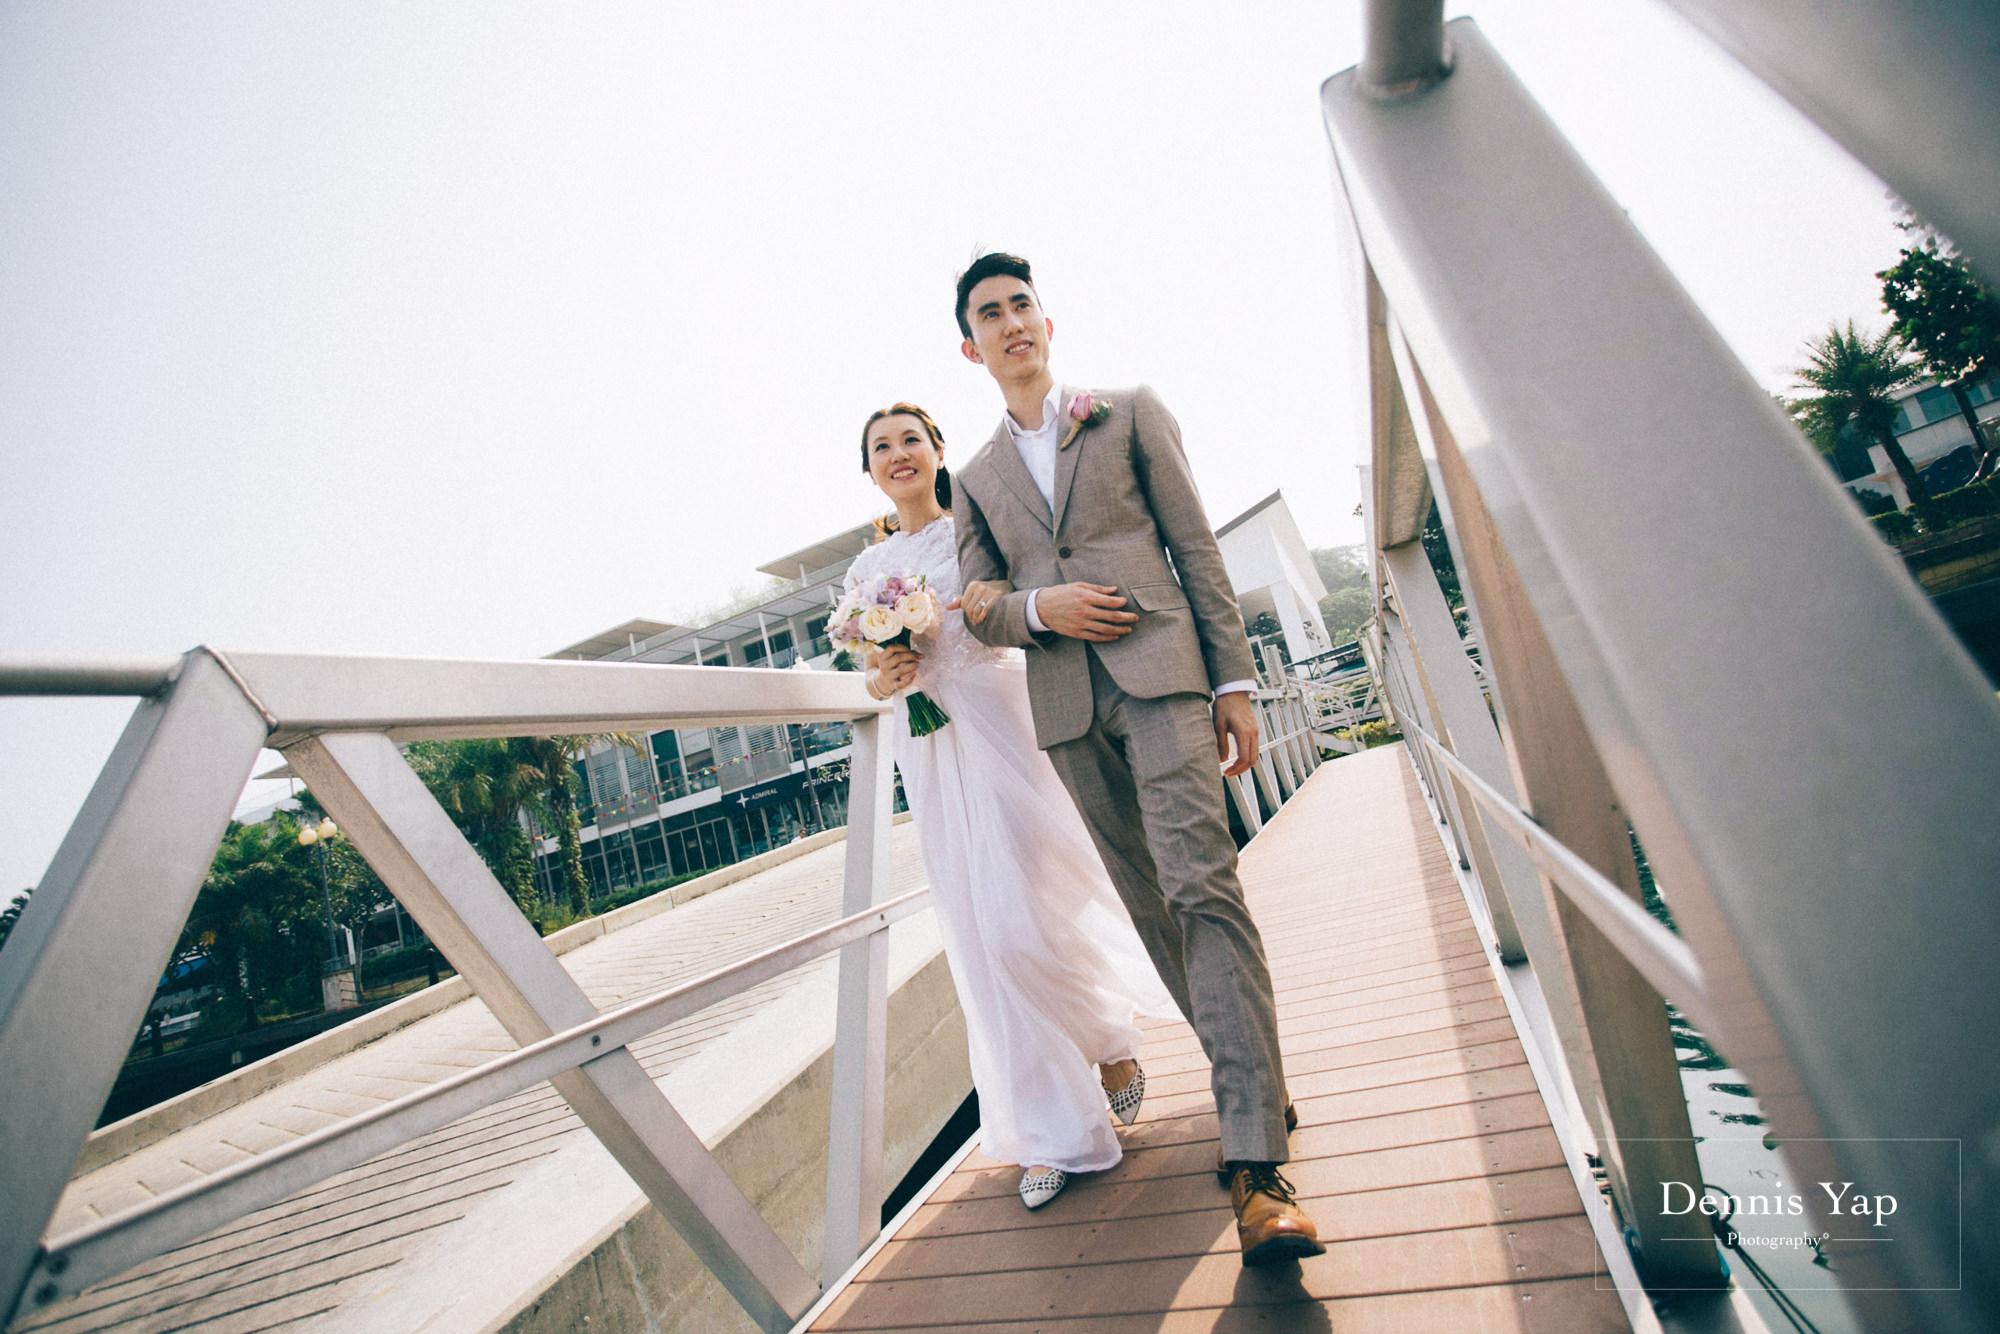 danny sherine wedding reception registration of marriage yacht fun beloved sea dennis yap photography malaysia top wedding photographer-16.jpg